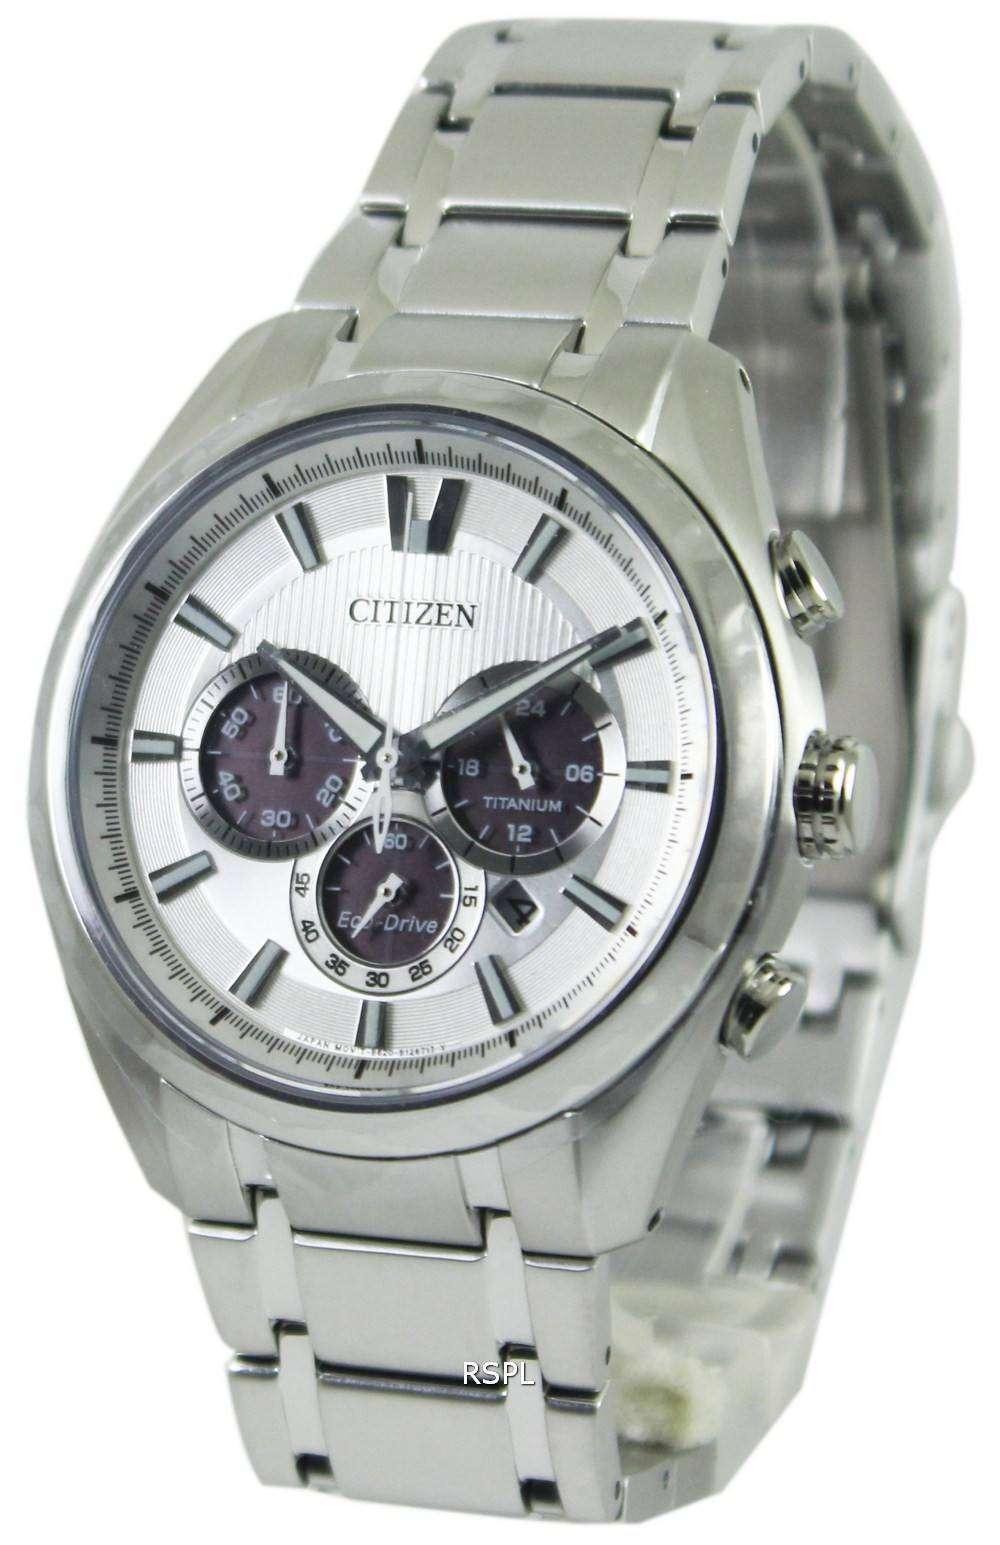 817fcba2b58 Citizen Eco-Drive Titanium Chronograph CA4010-58A Mens Watch ...